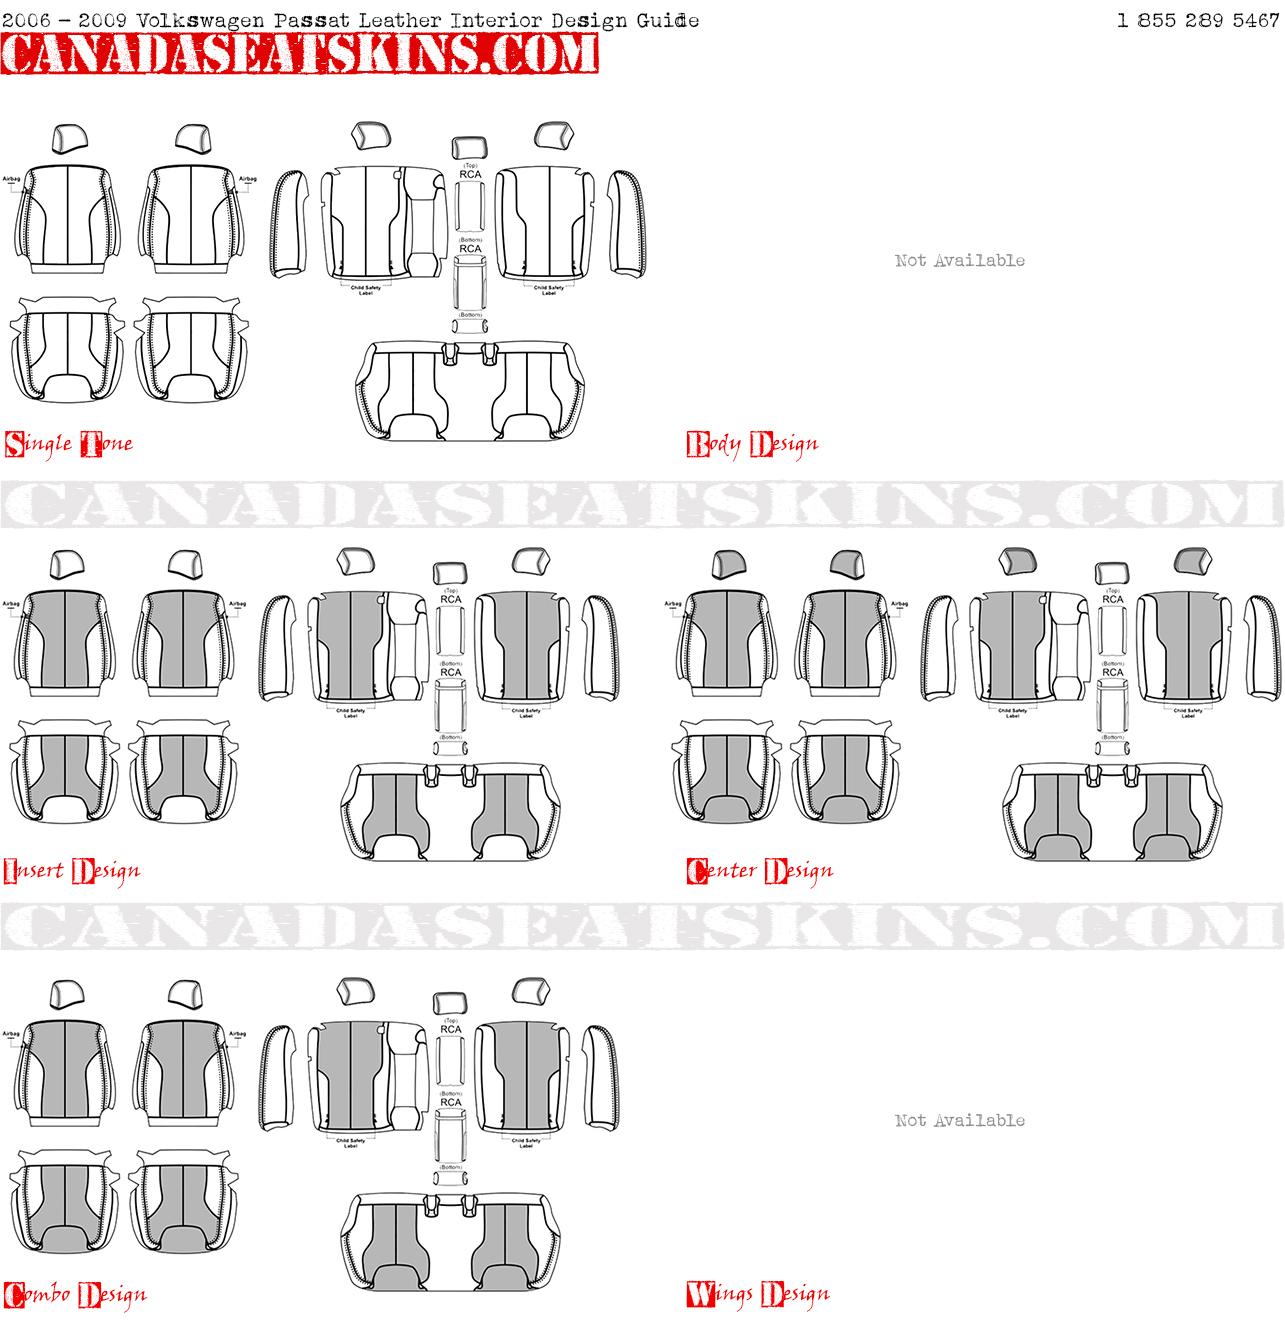 2006 2009 Volkswagen Passat Custom Leather Upholstery